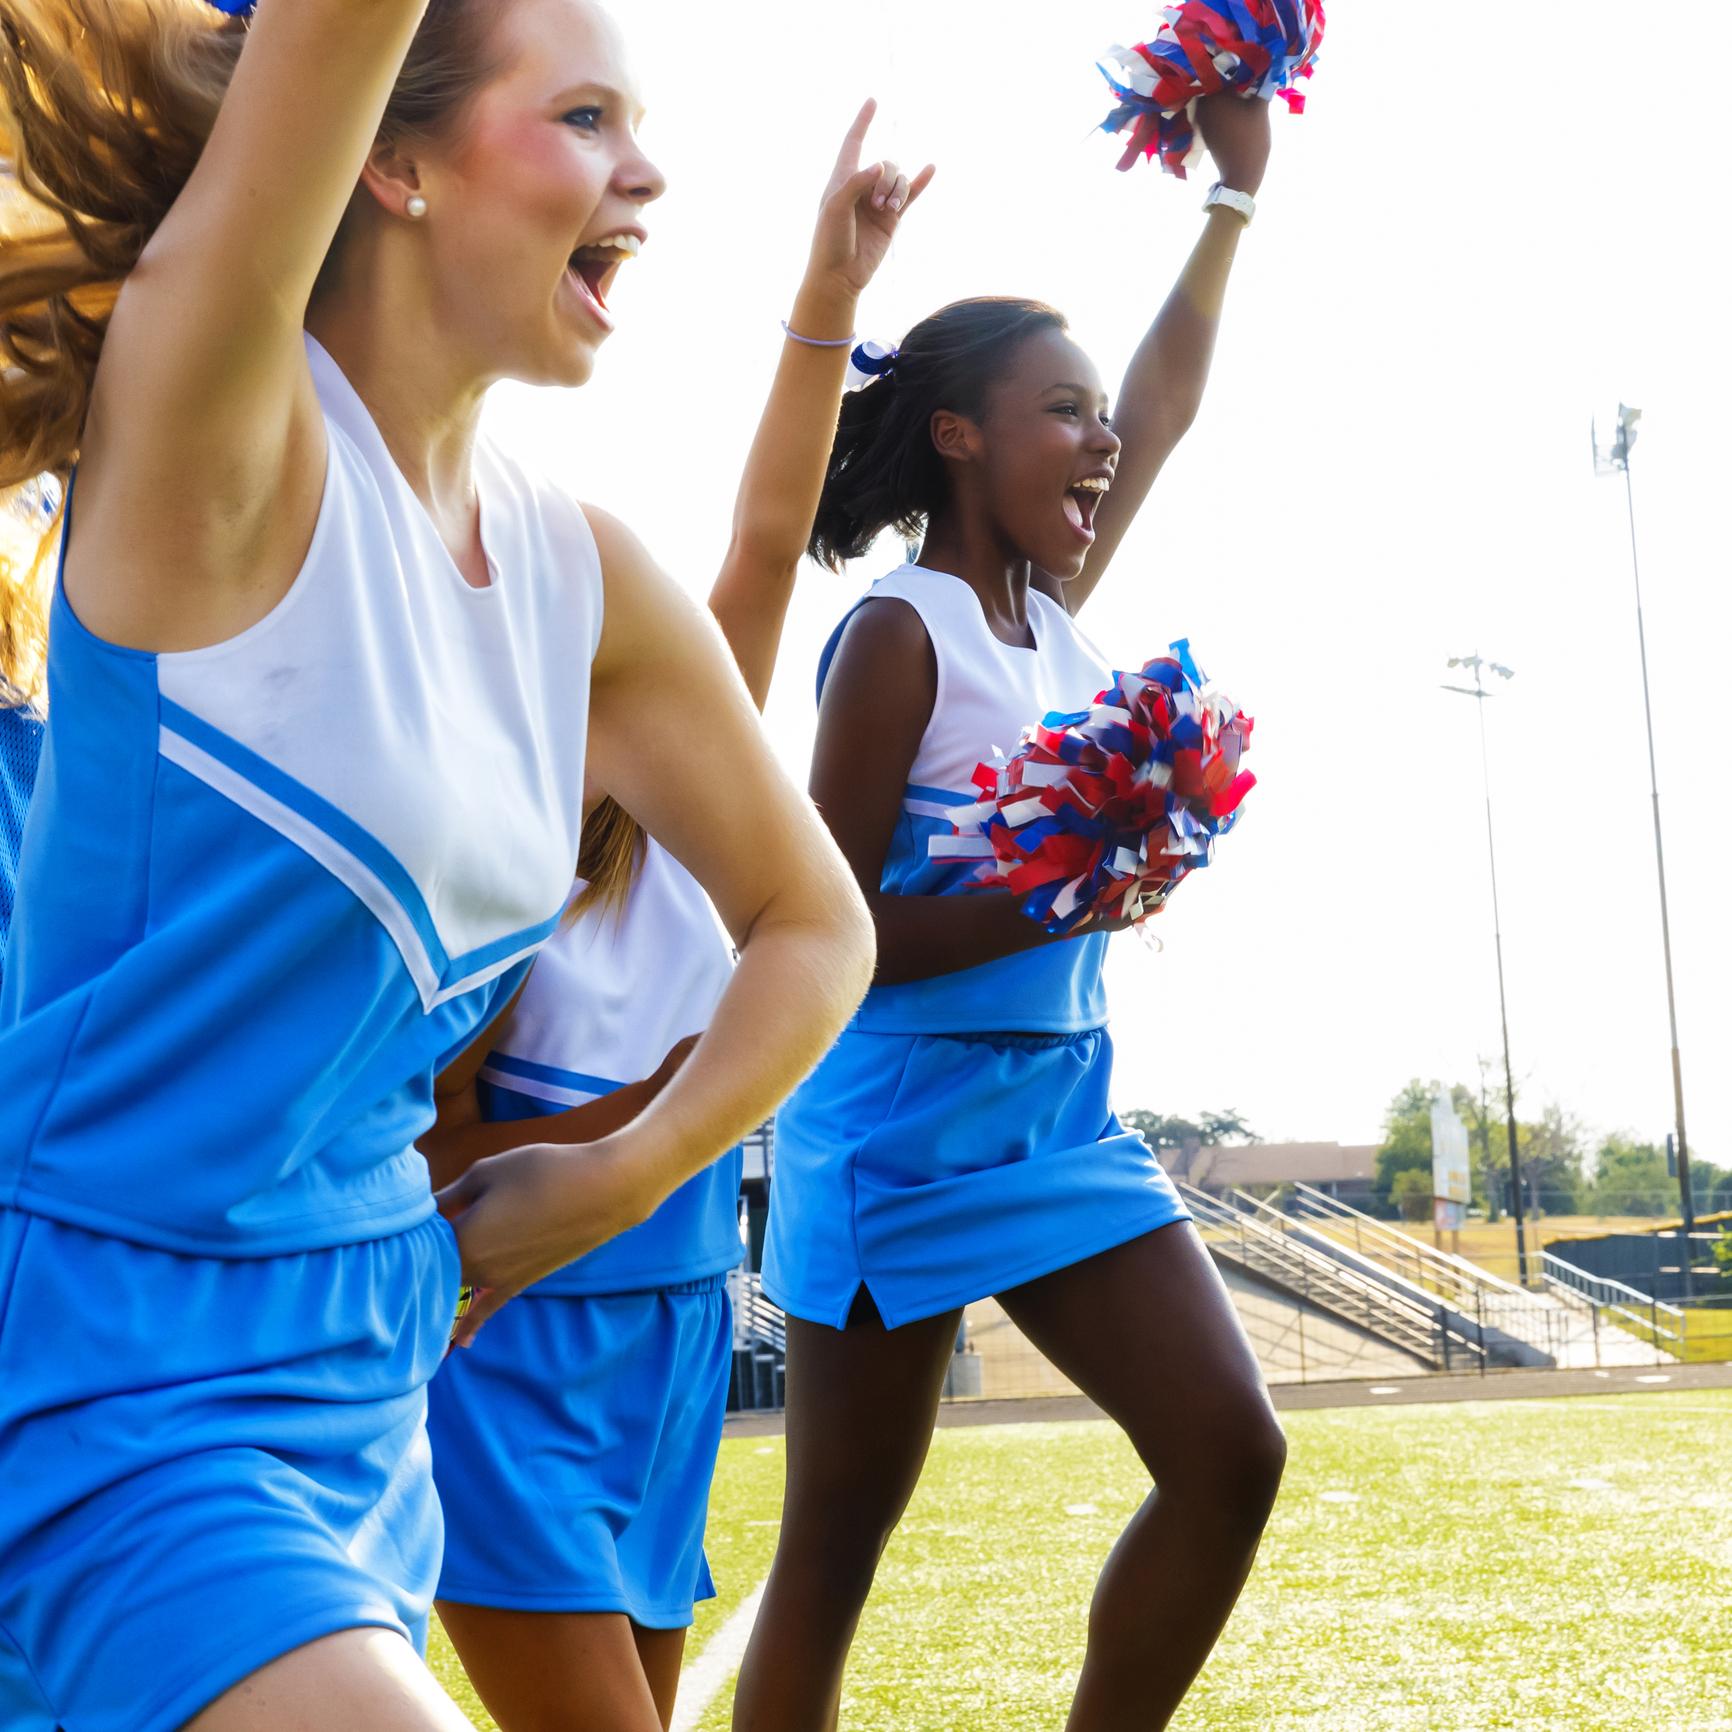 Football Cheerleaders